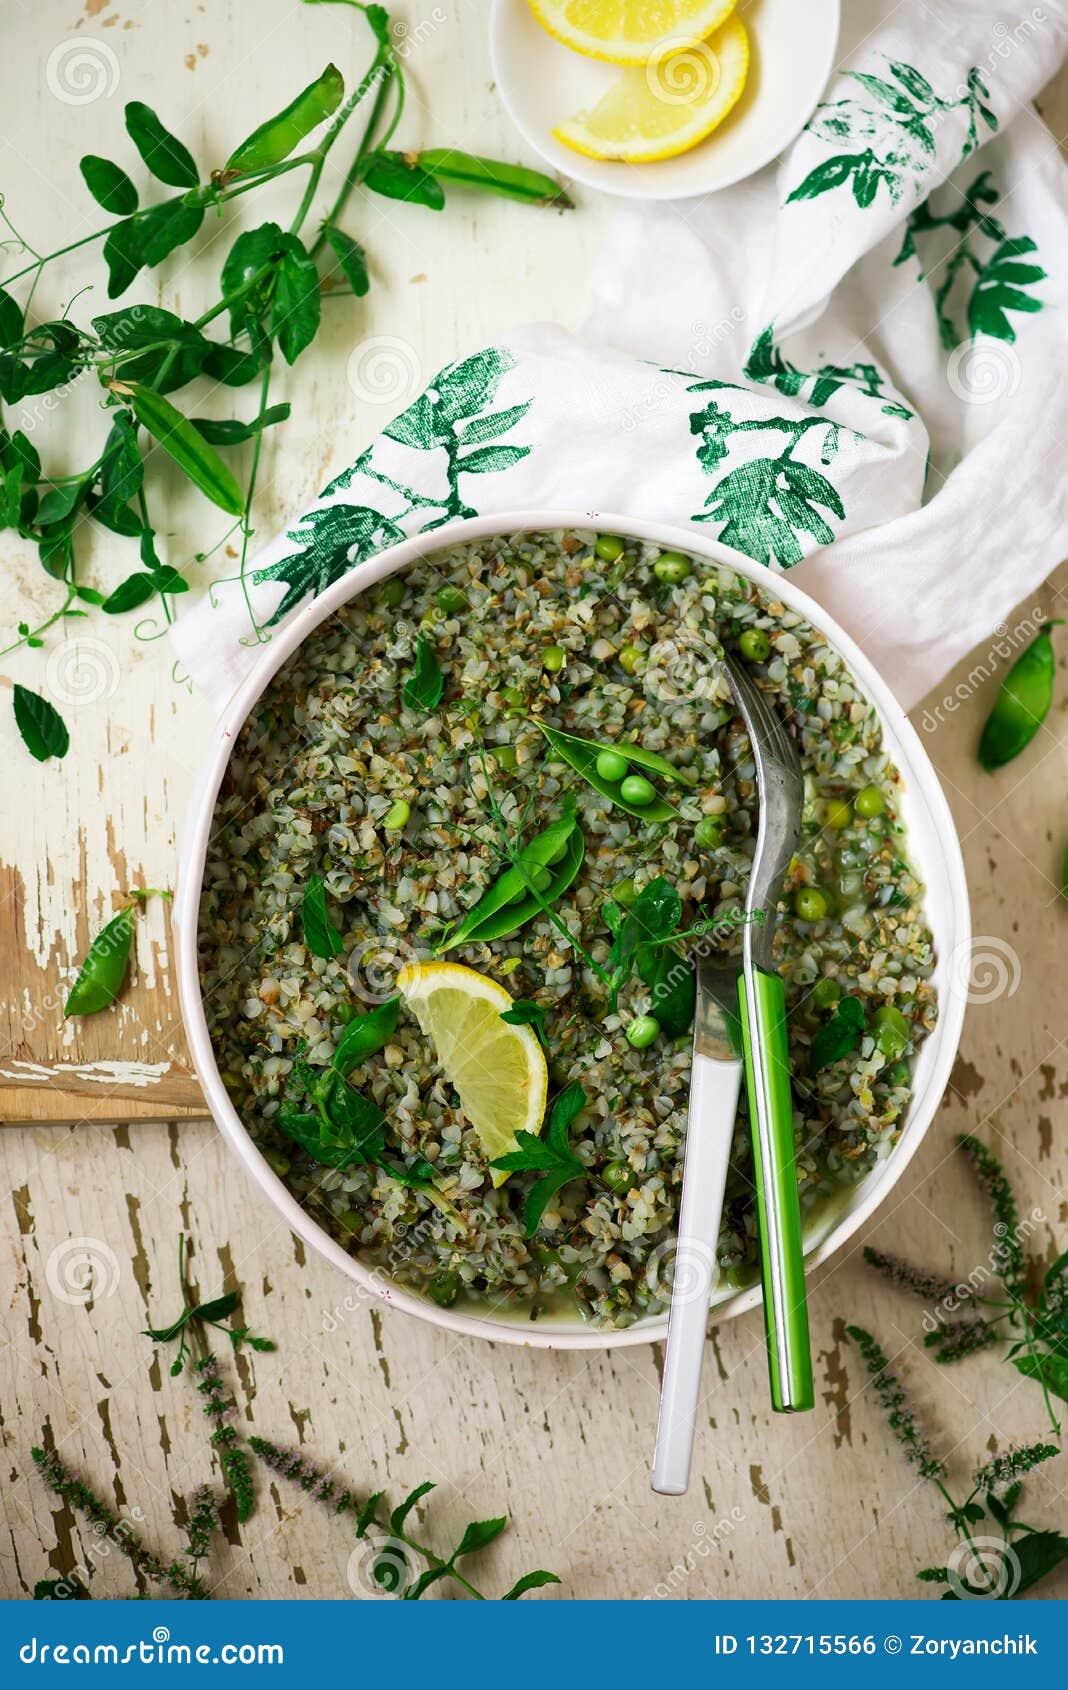 Buckweat and green peas risotto vegeterian dish